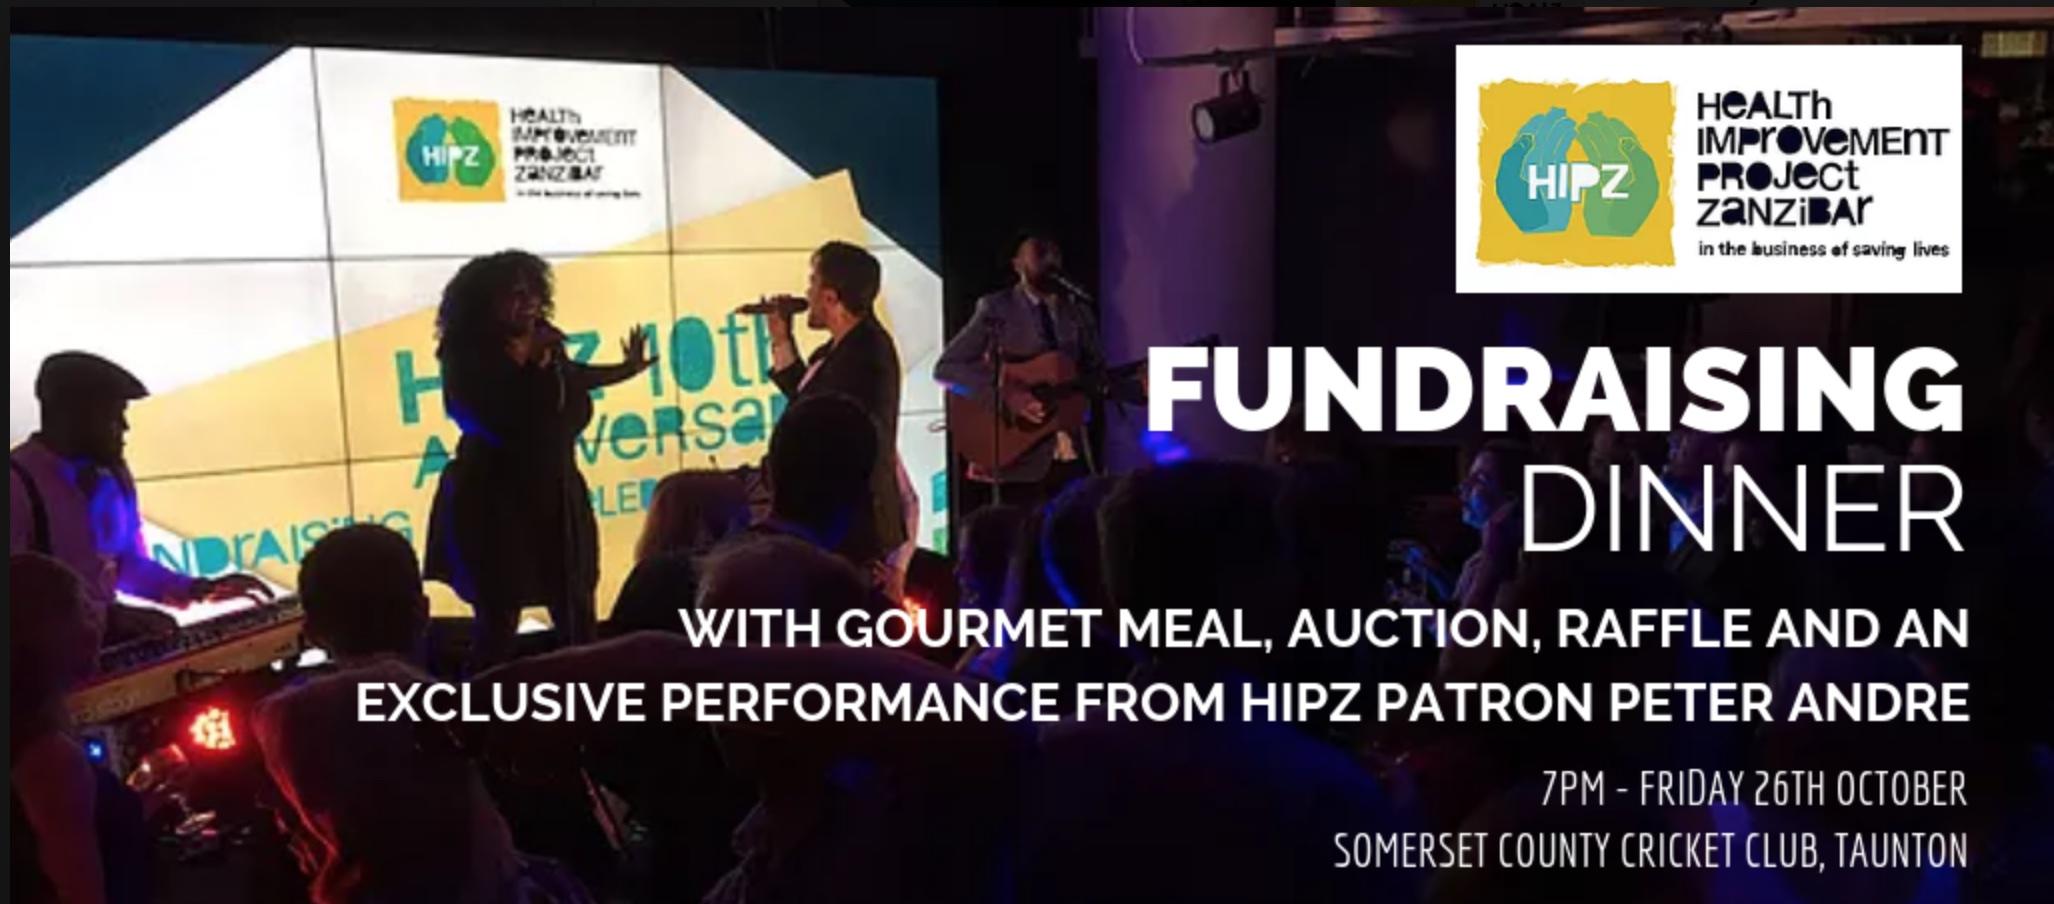 fund-raising-dinner.jpg